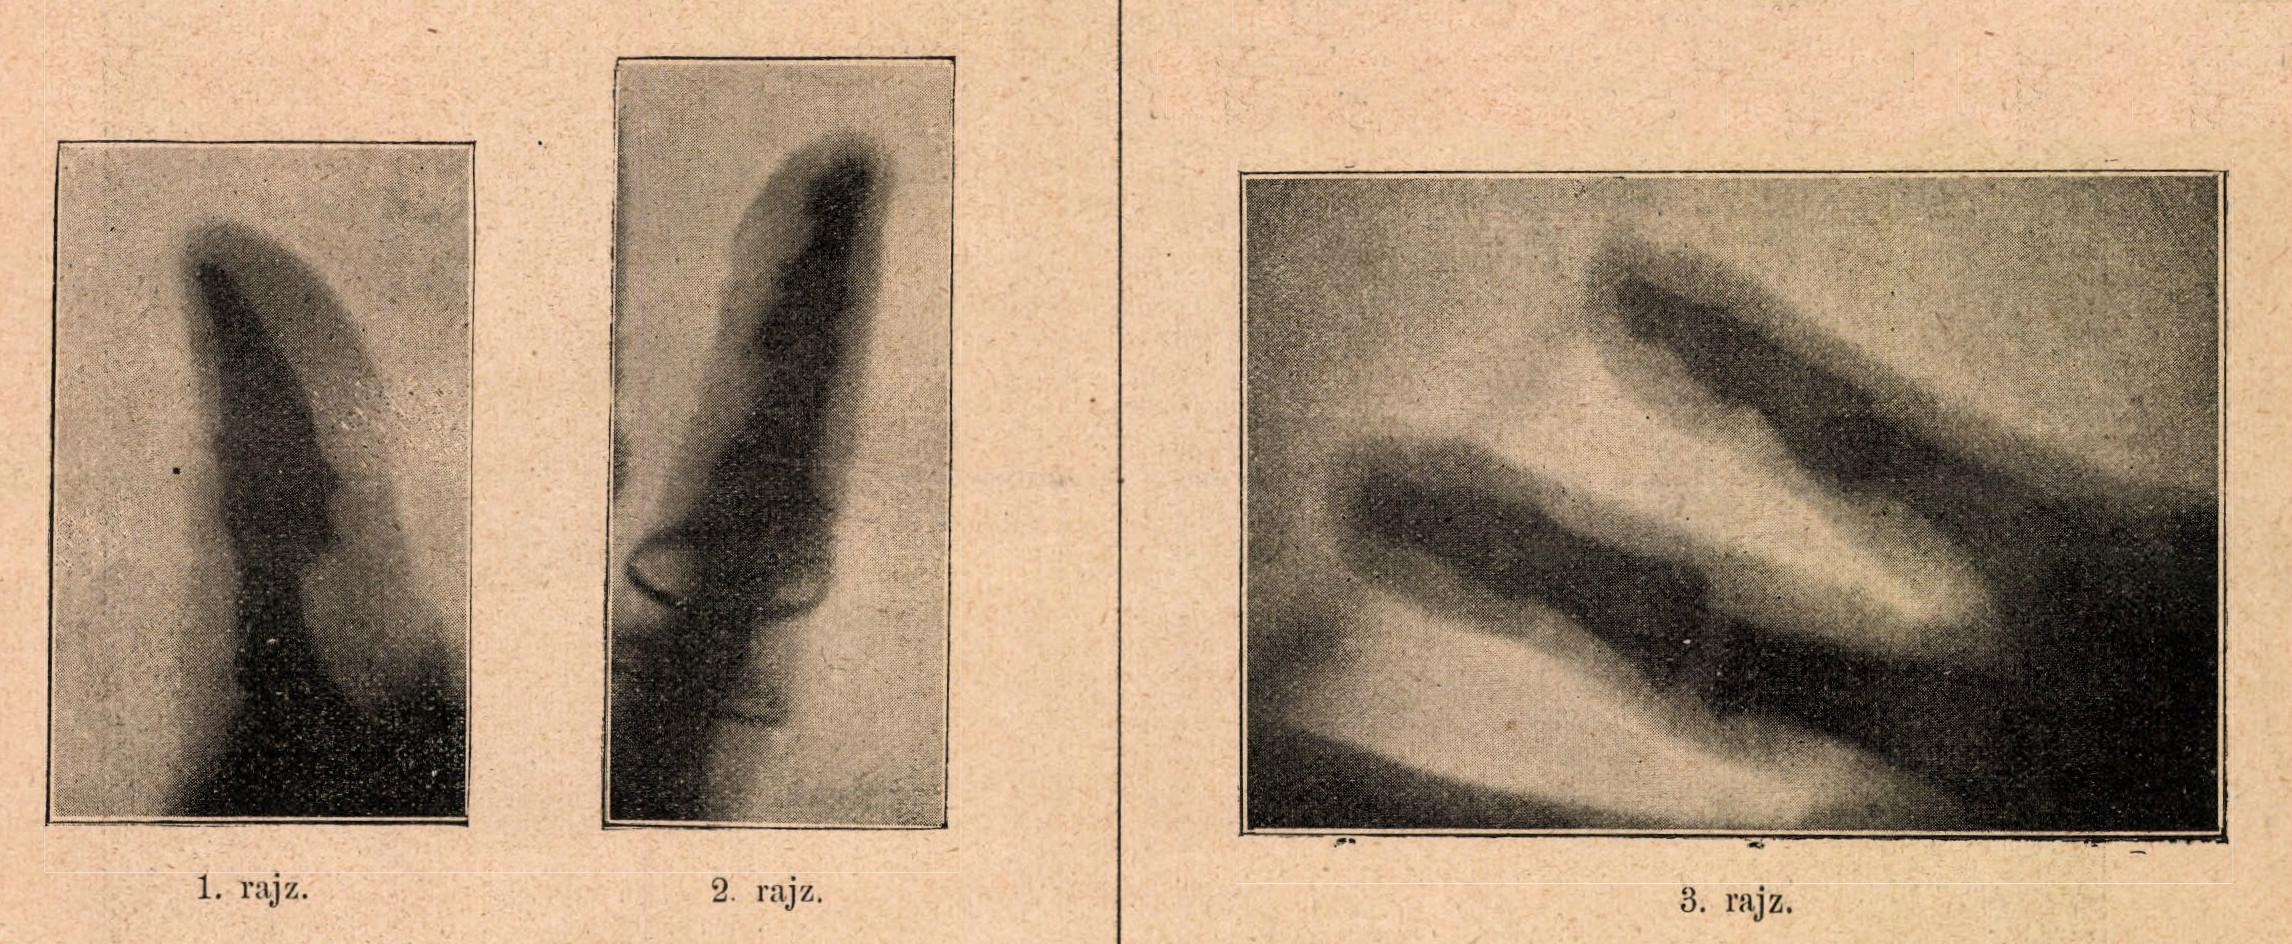 02_dr_klupathy_jeno_ujjakrol_keszitett_rontgenfelvetelei_orvosi_hetilap_1896_januar_19.jpg